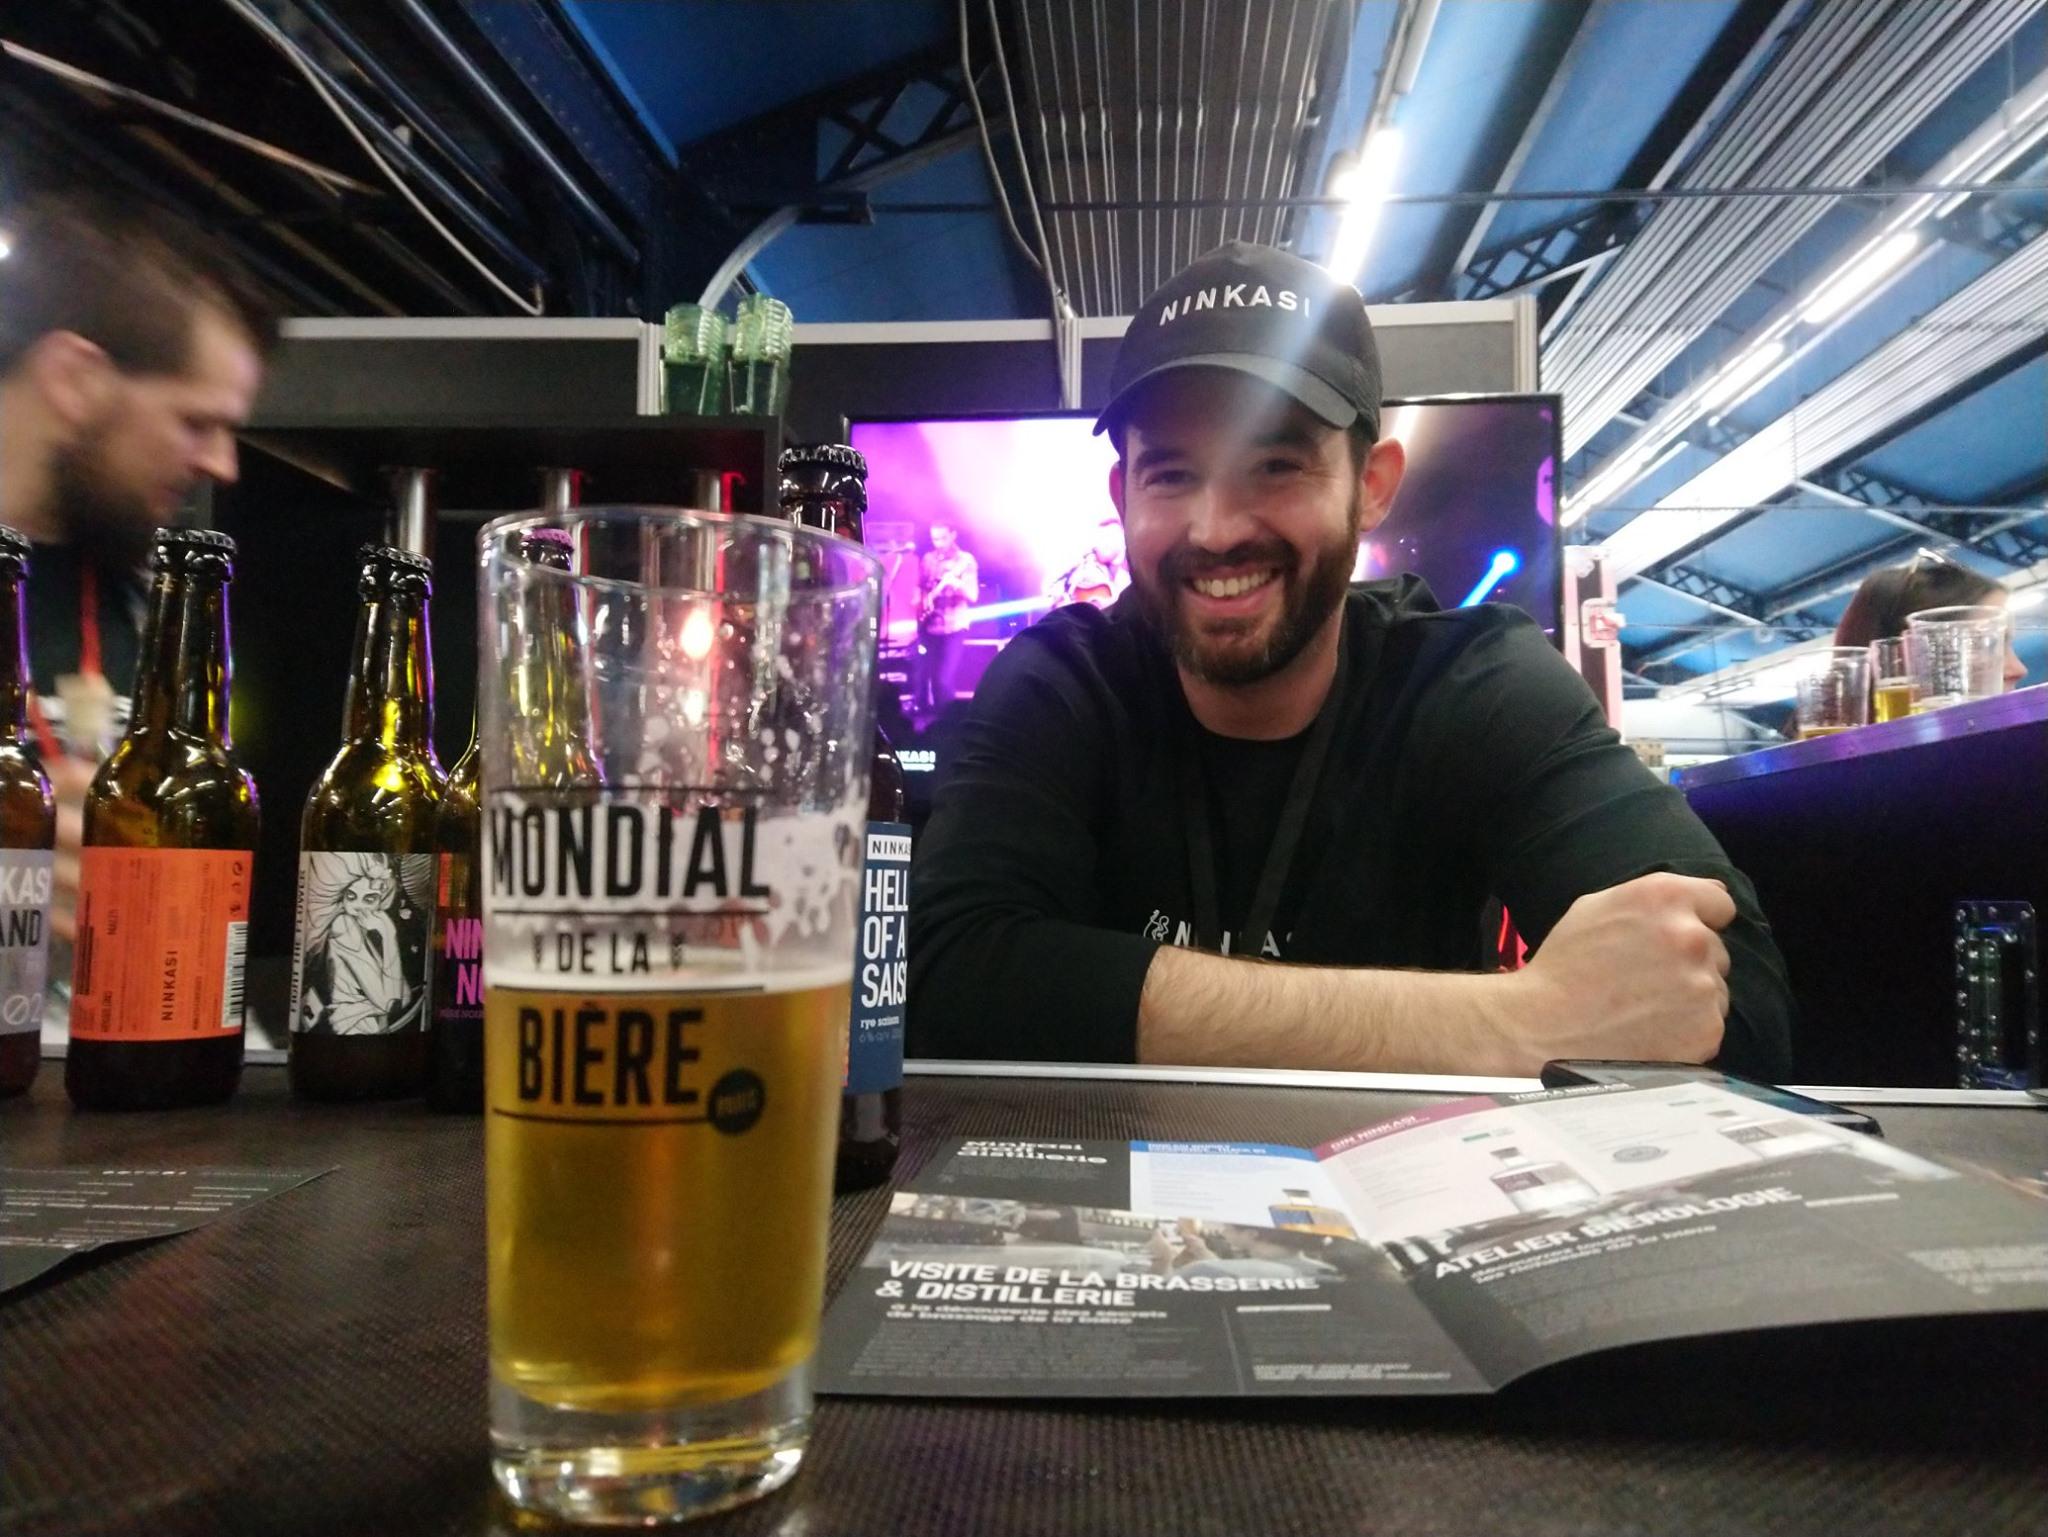 Matthieu Mahé - Ninkasi - Mondial de la Bière 2019